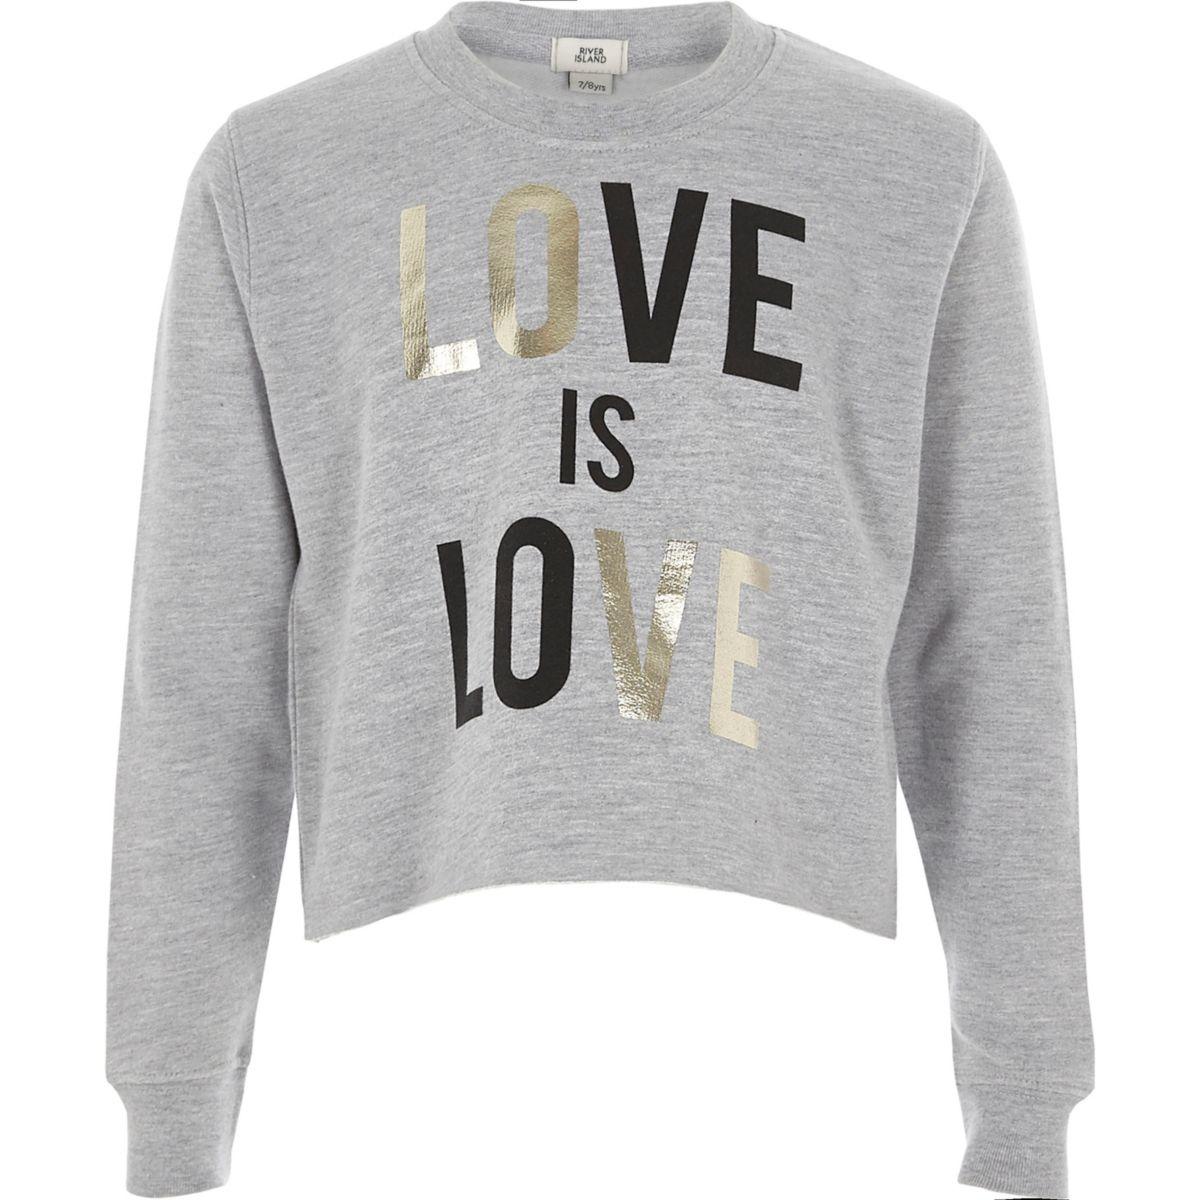 Girls grey 'love is love' cropped sweatshirt